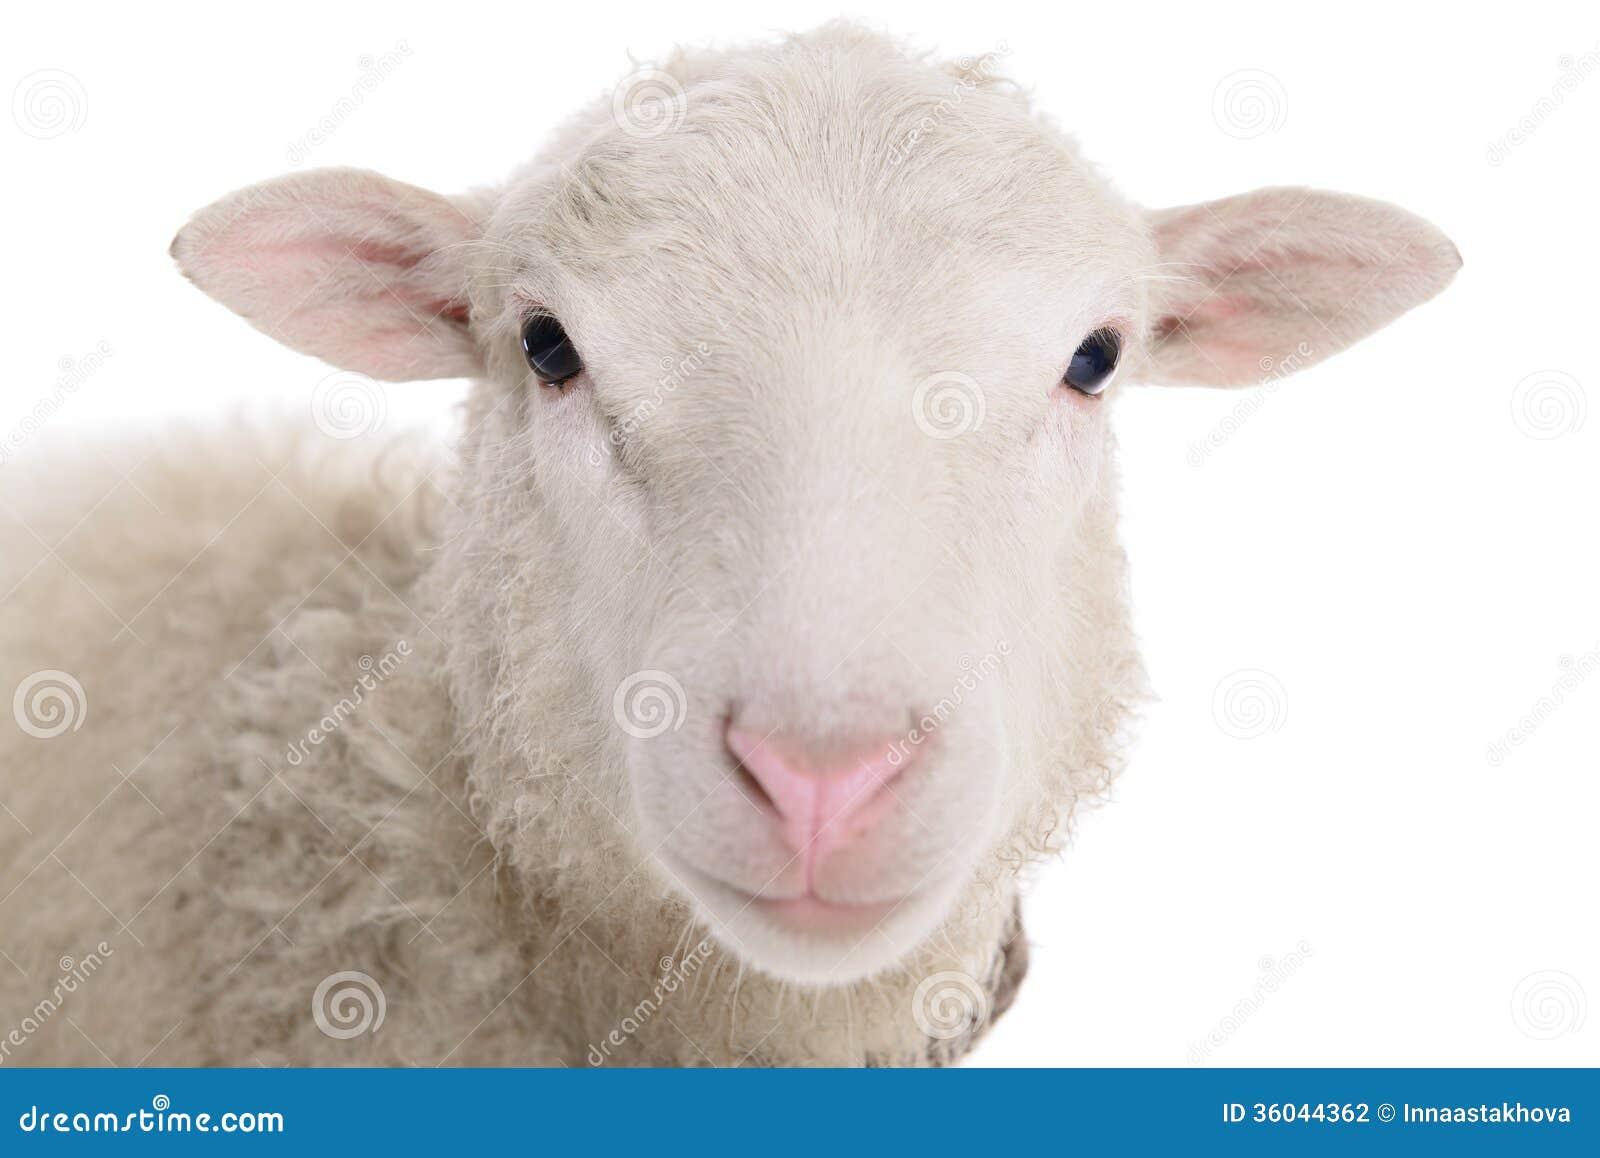 White sheep - photo#21